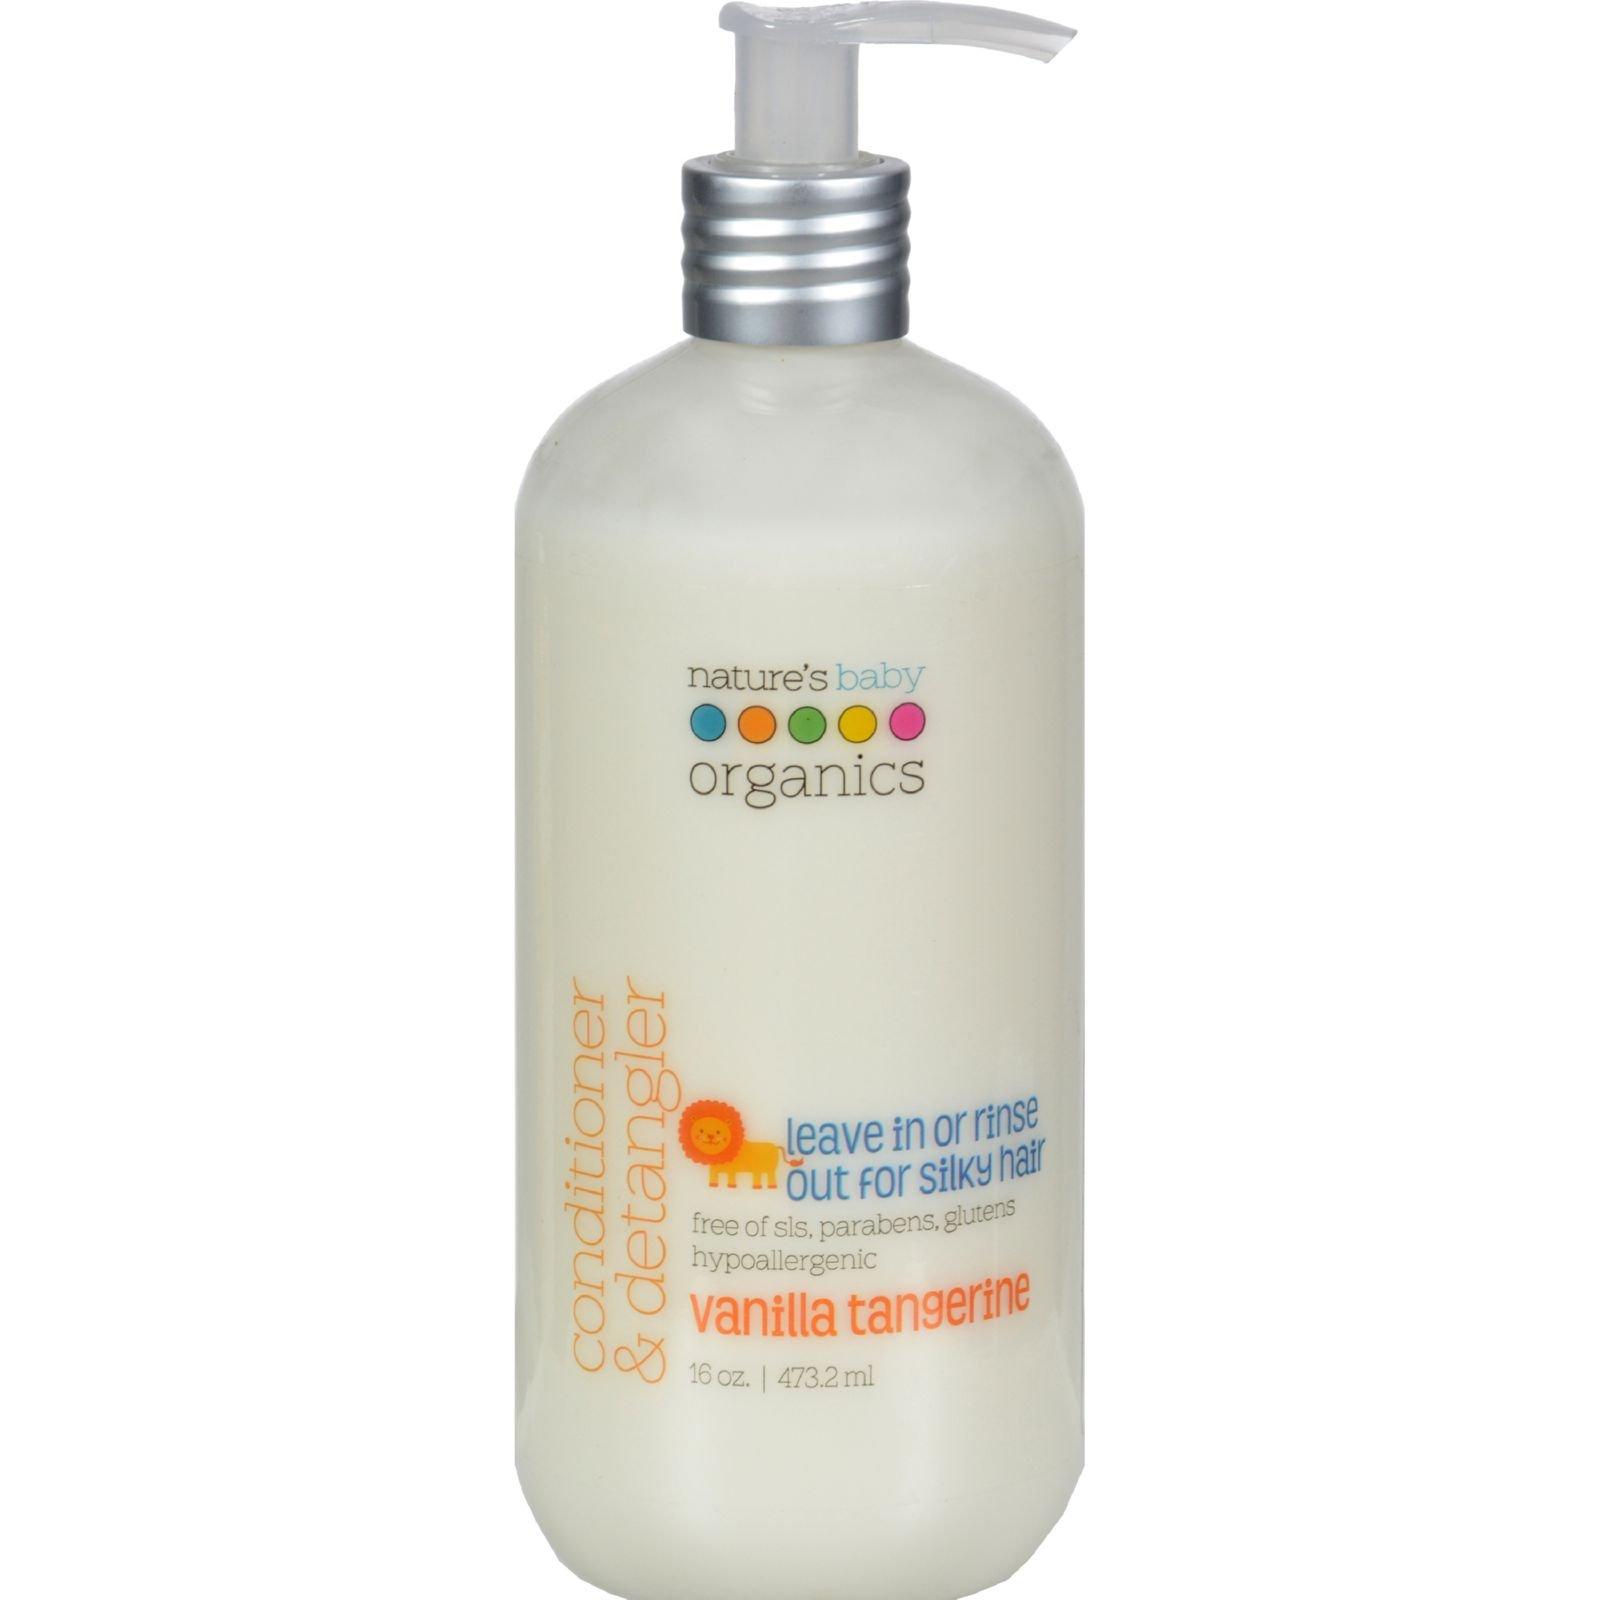 Nature's Baby Organics Conditioner And Detangler Vanilla Tangerine - 16 Fl Oz